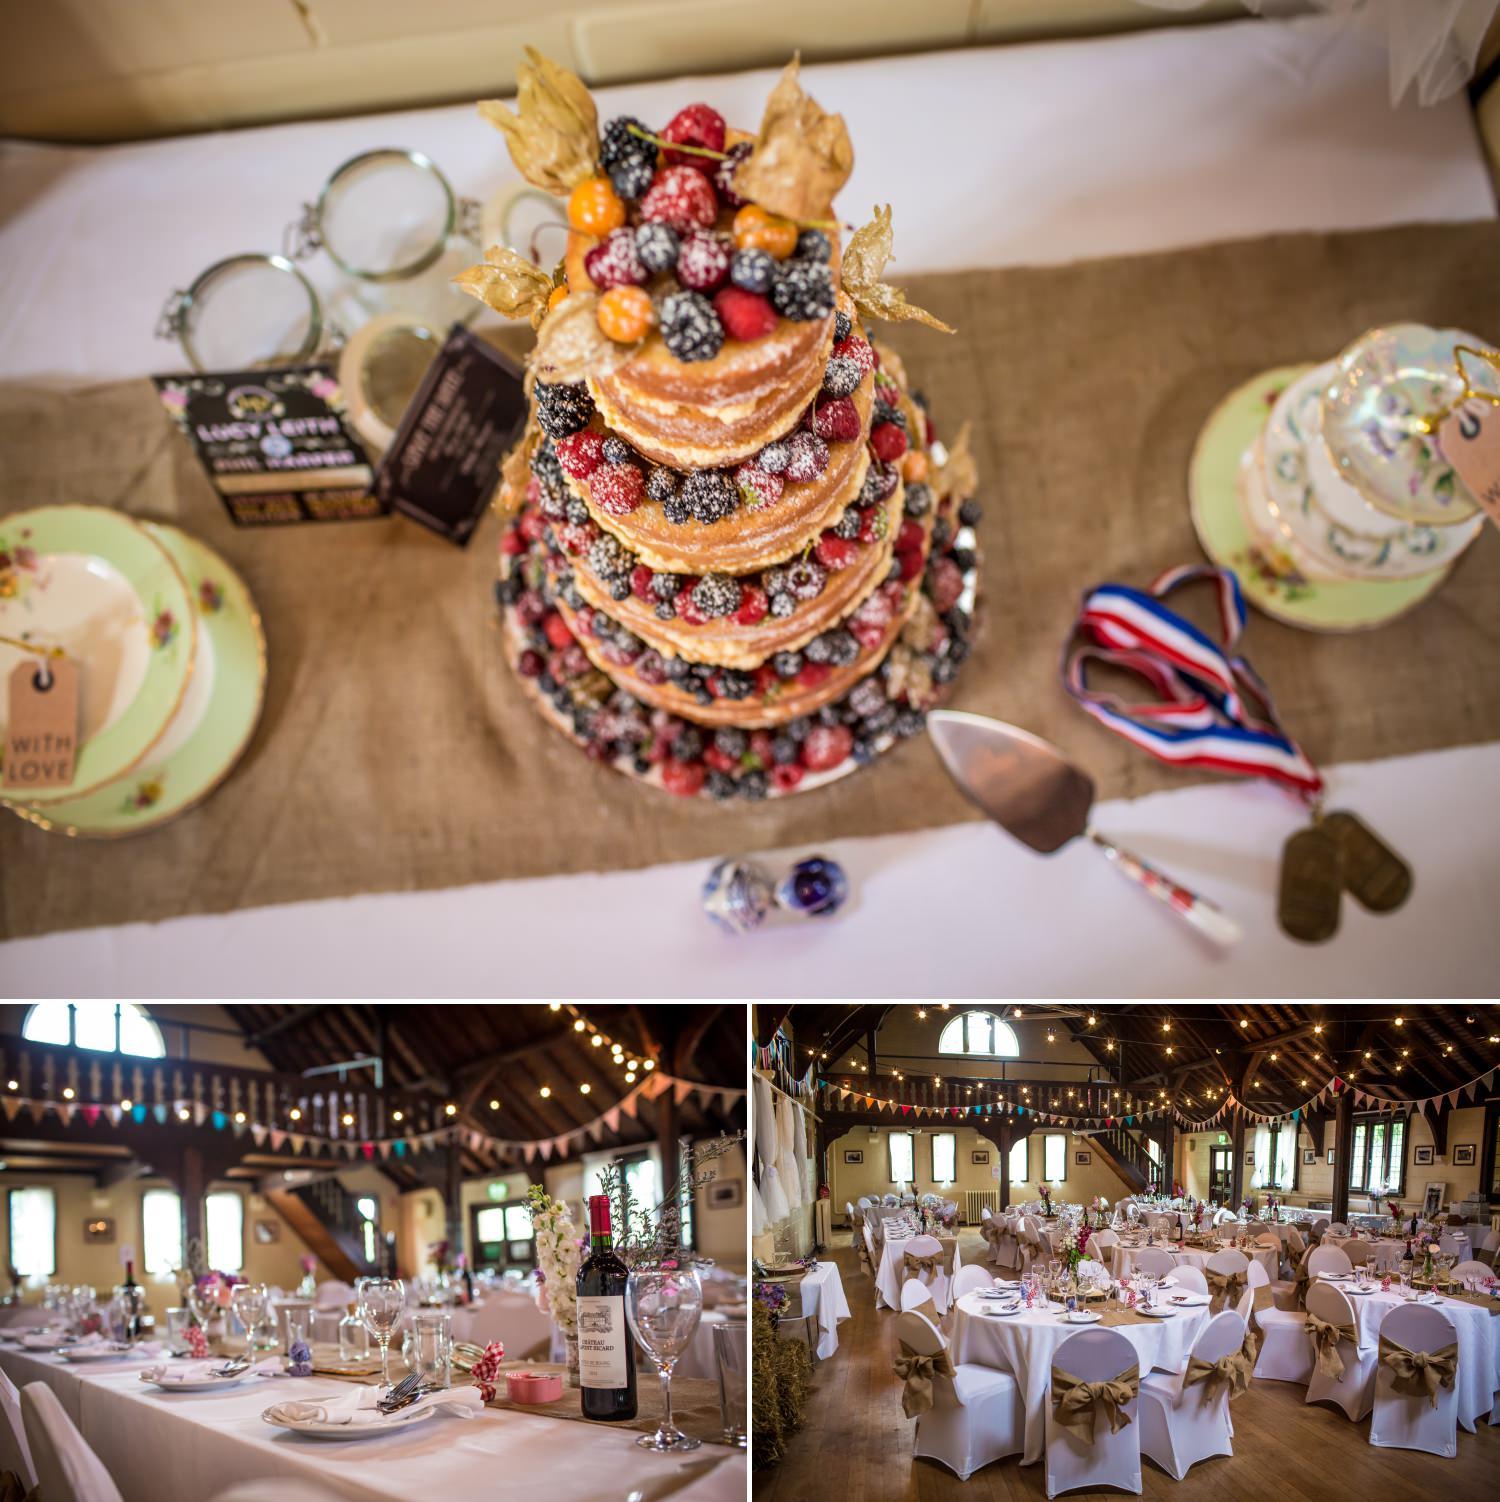 Wedding cake at Worfield village hall